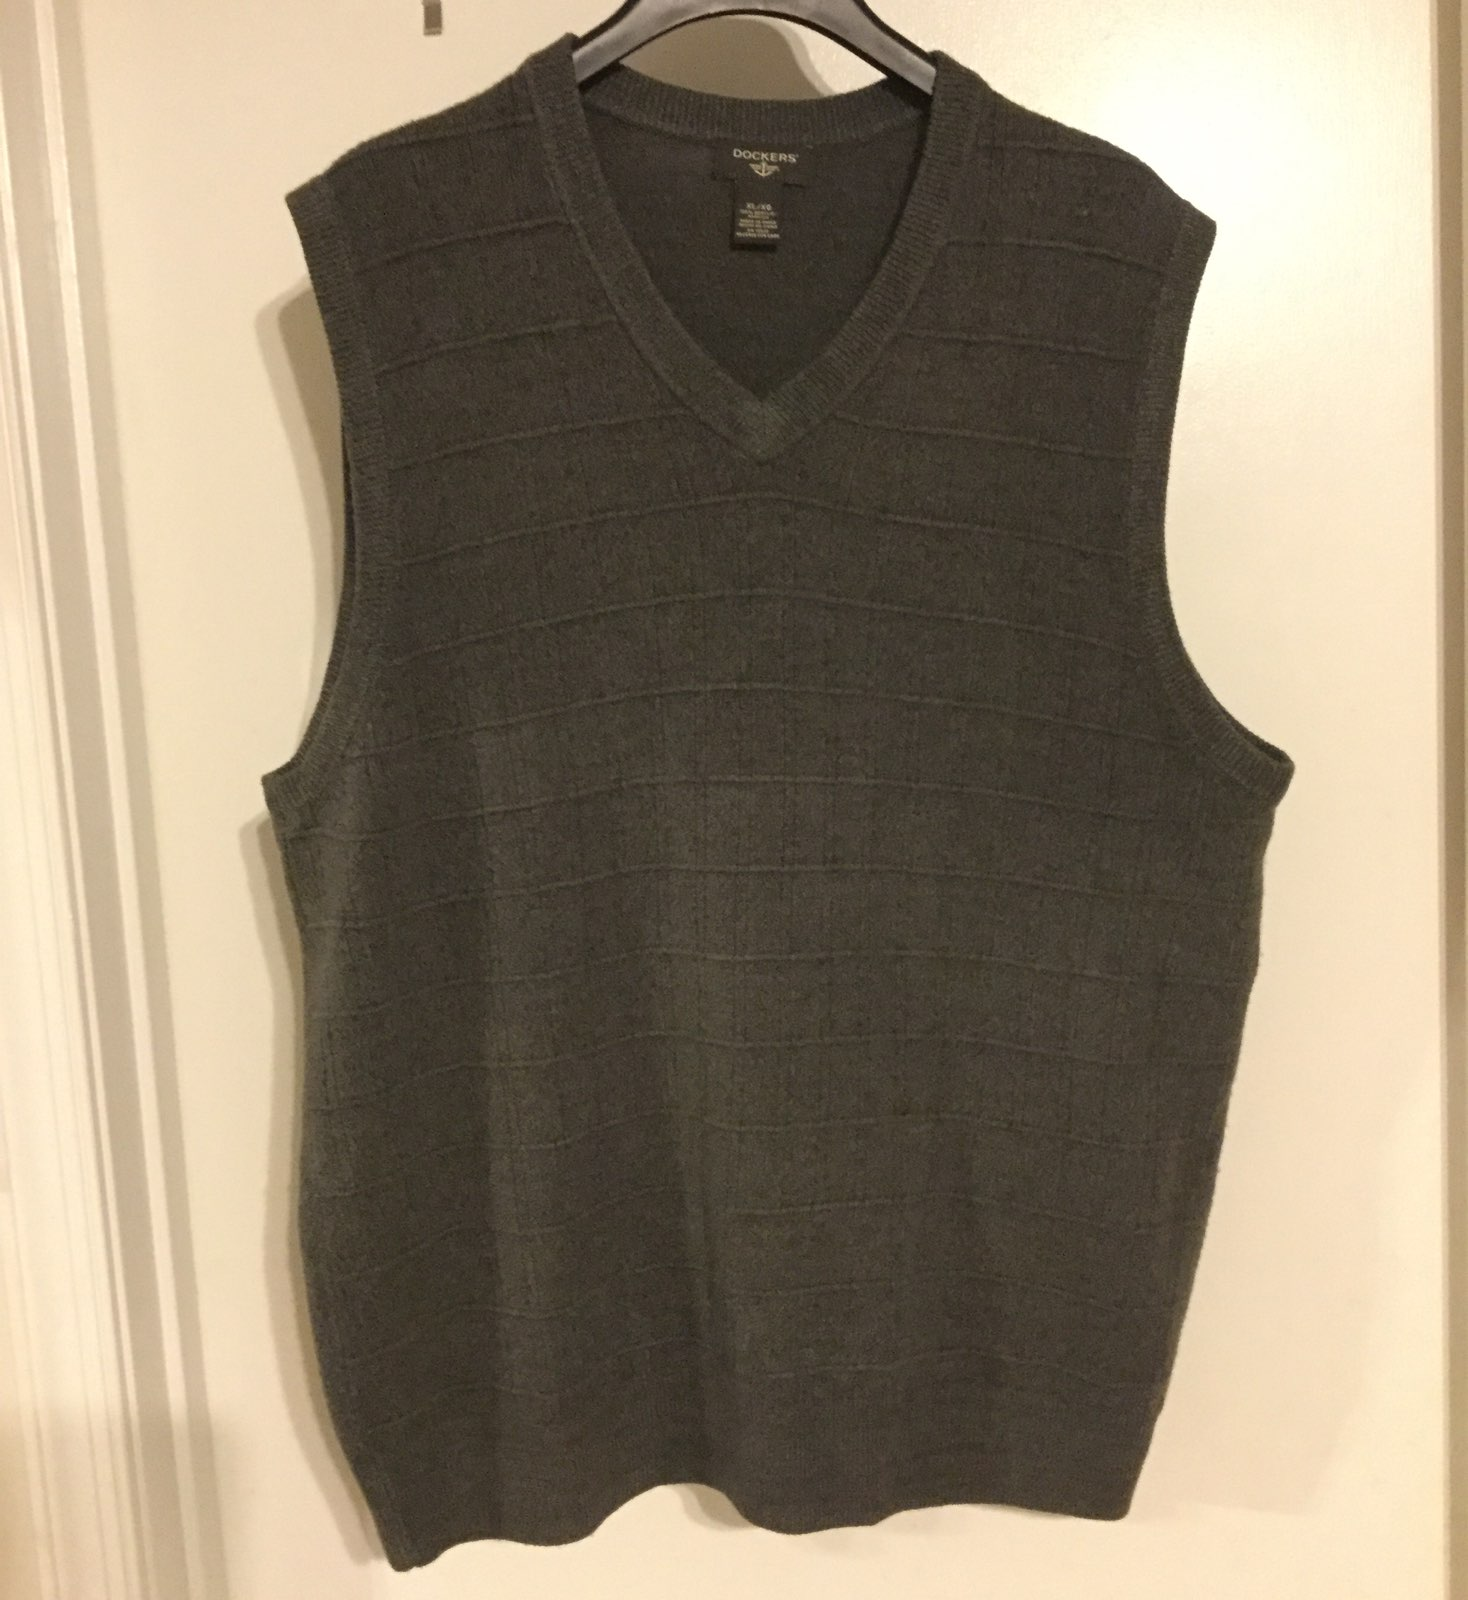 Men's Dockers Sweater Vest Size XL Gray - Mercari: BUY & SELL ...